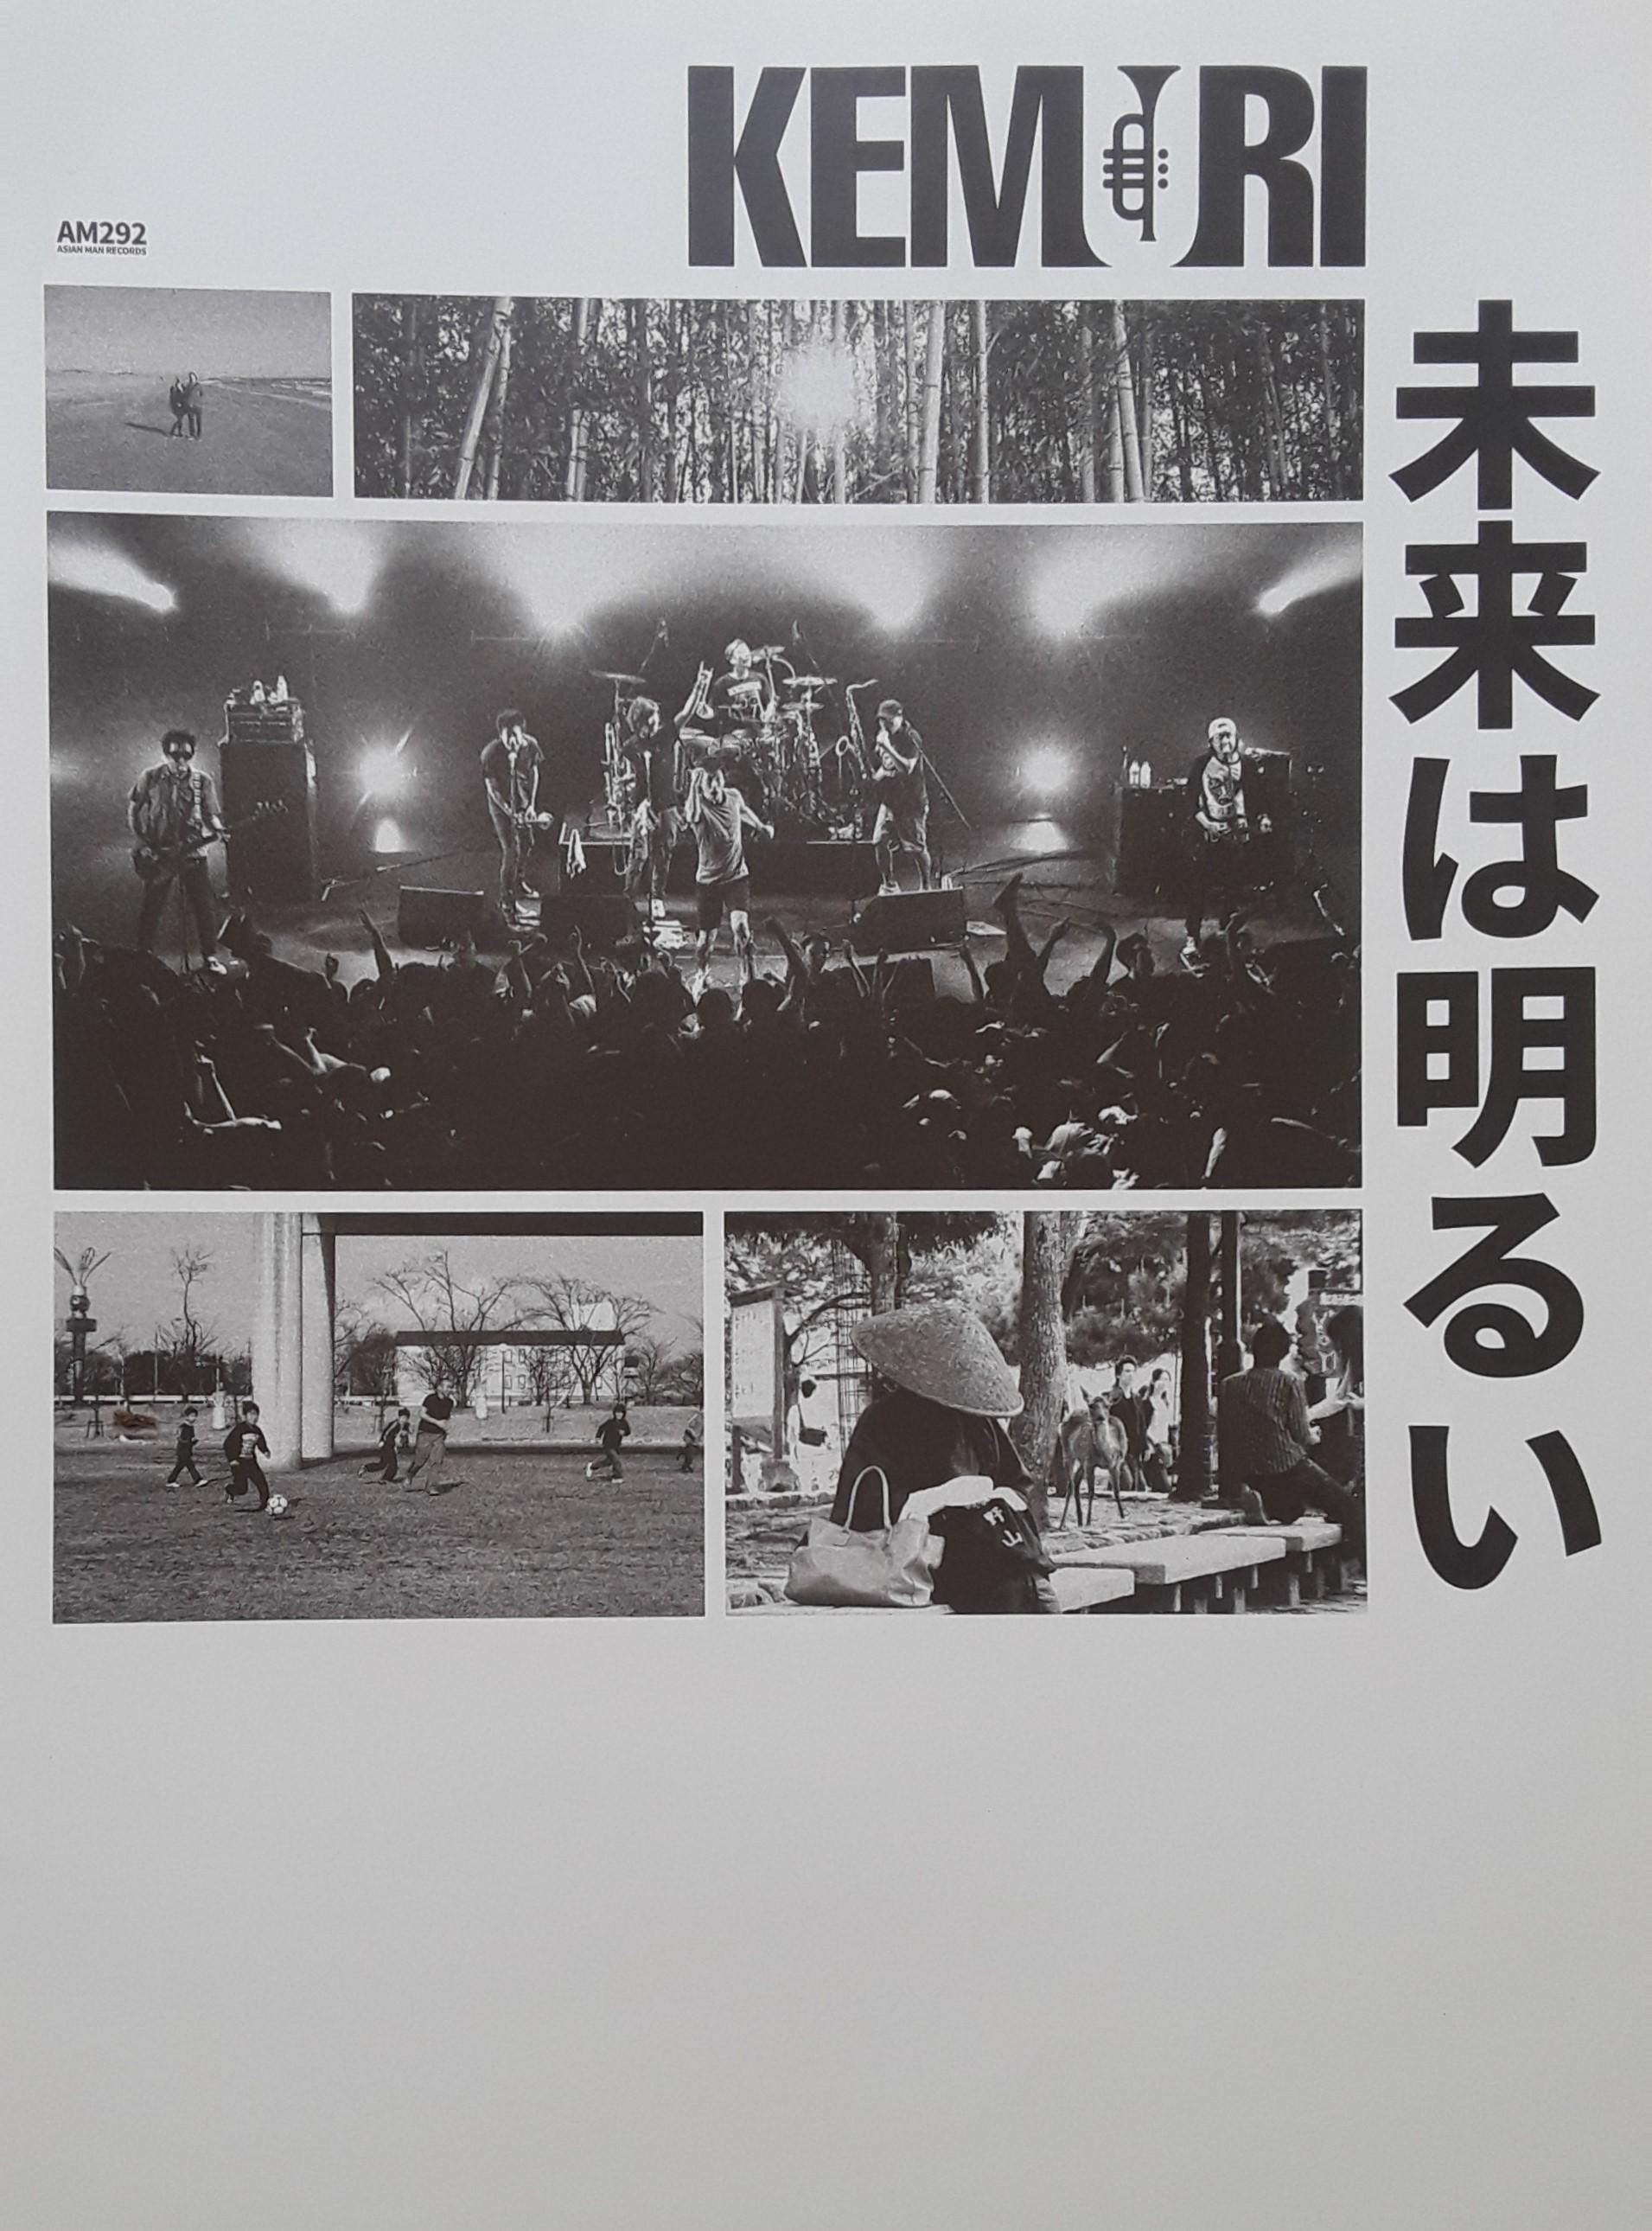 KEMURI poster